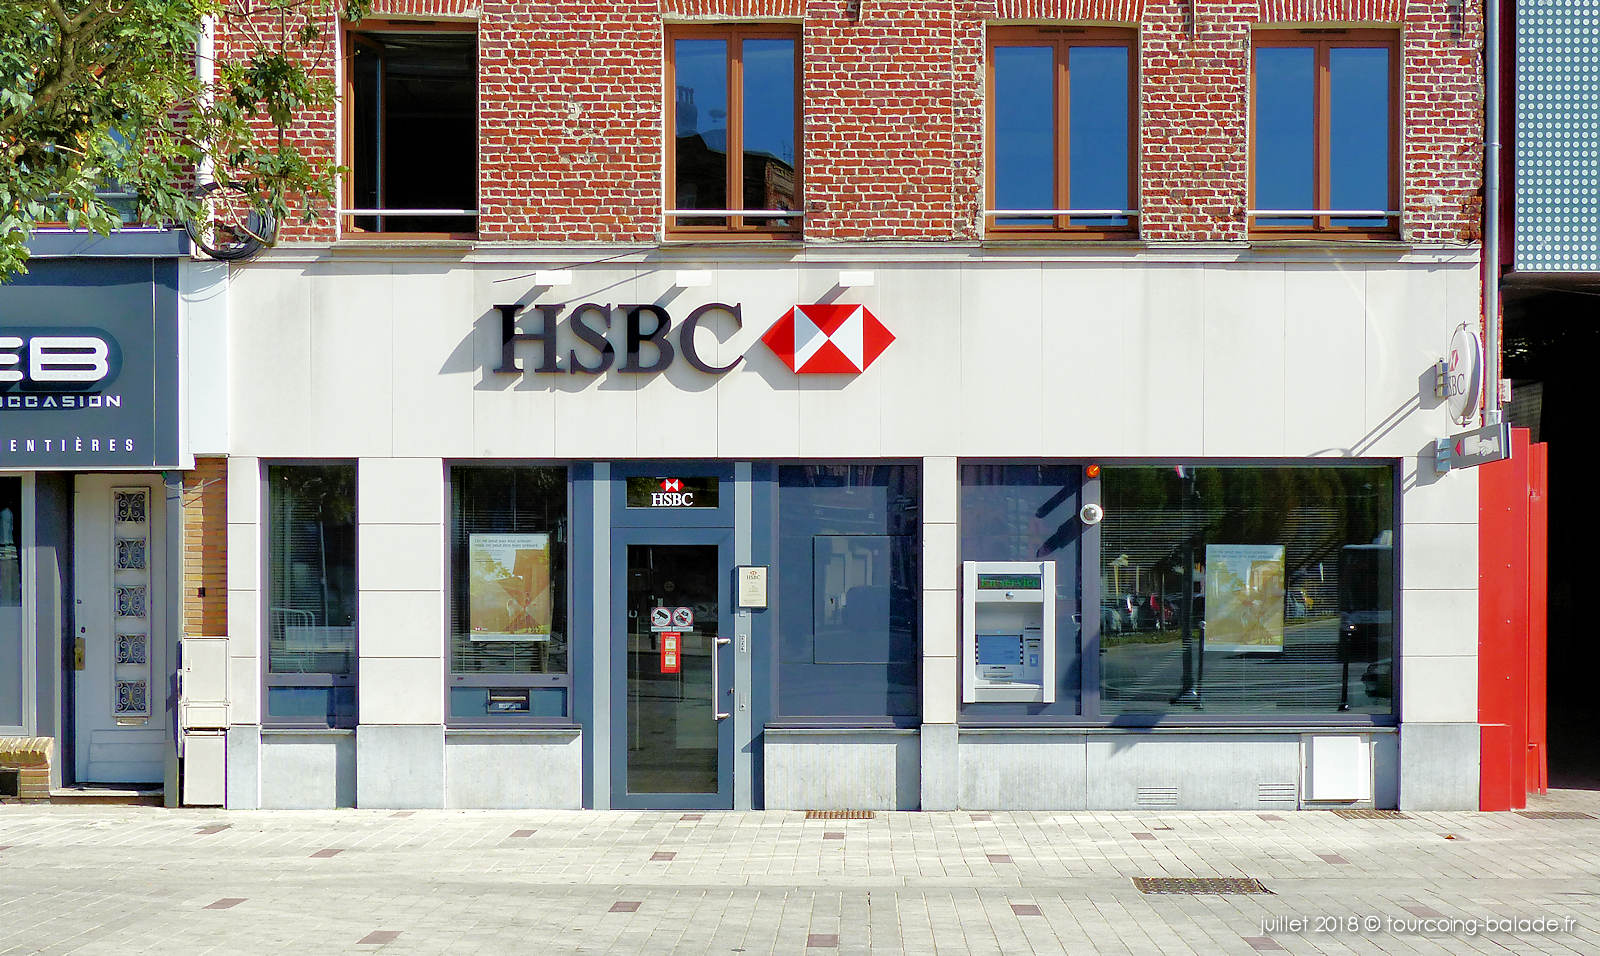 Banque HSBC Tourcoing - Place Roussel